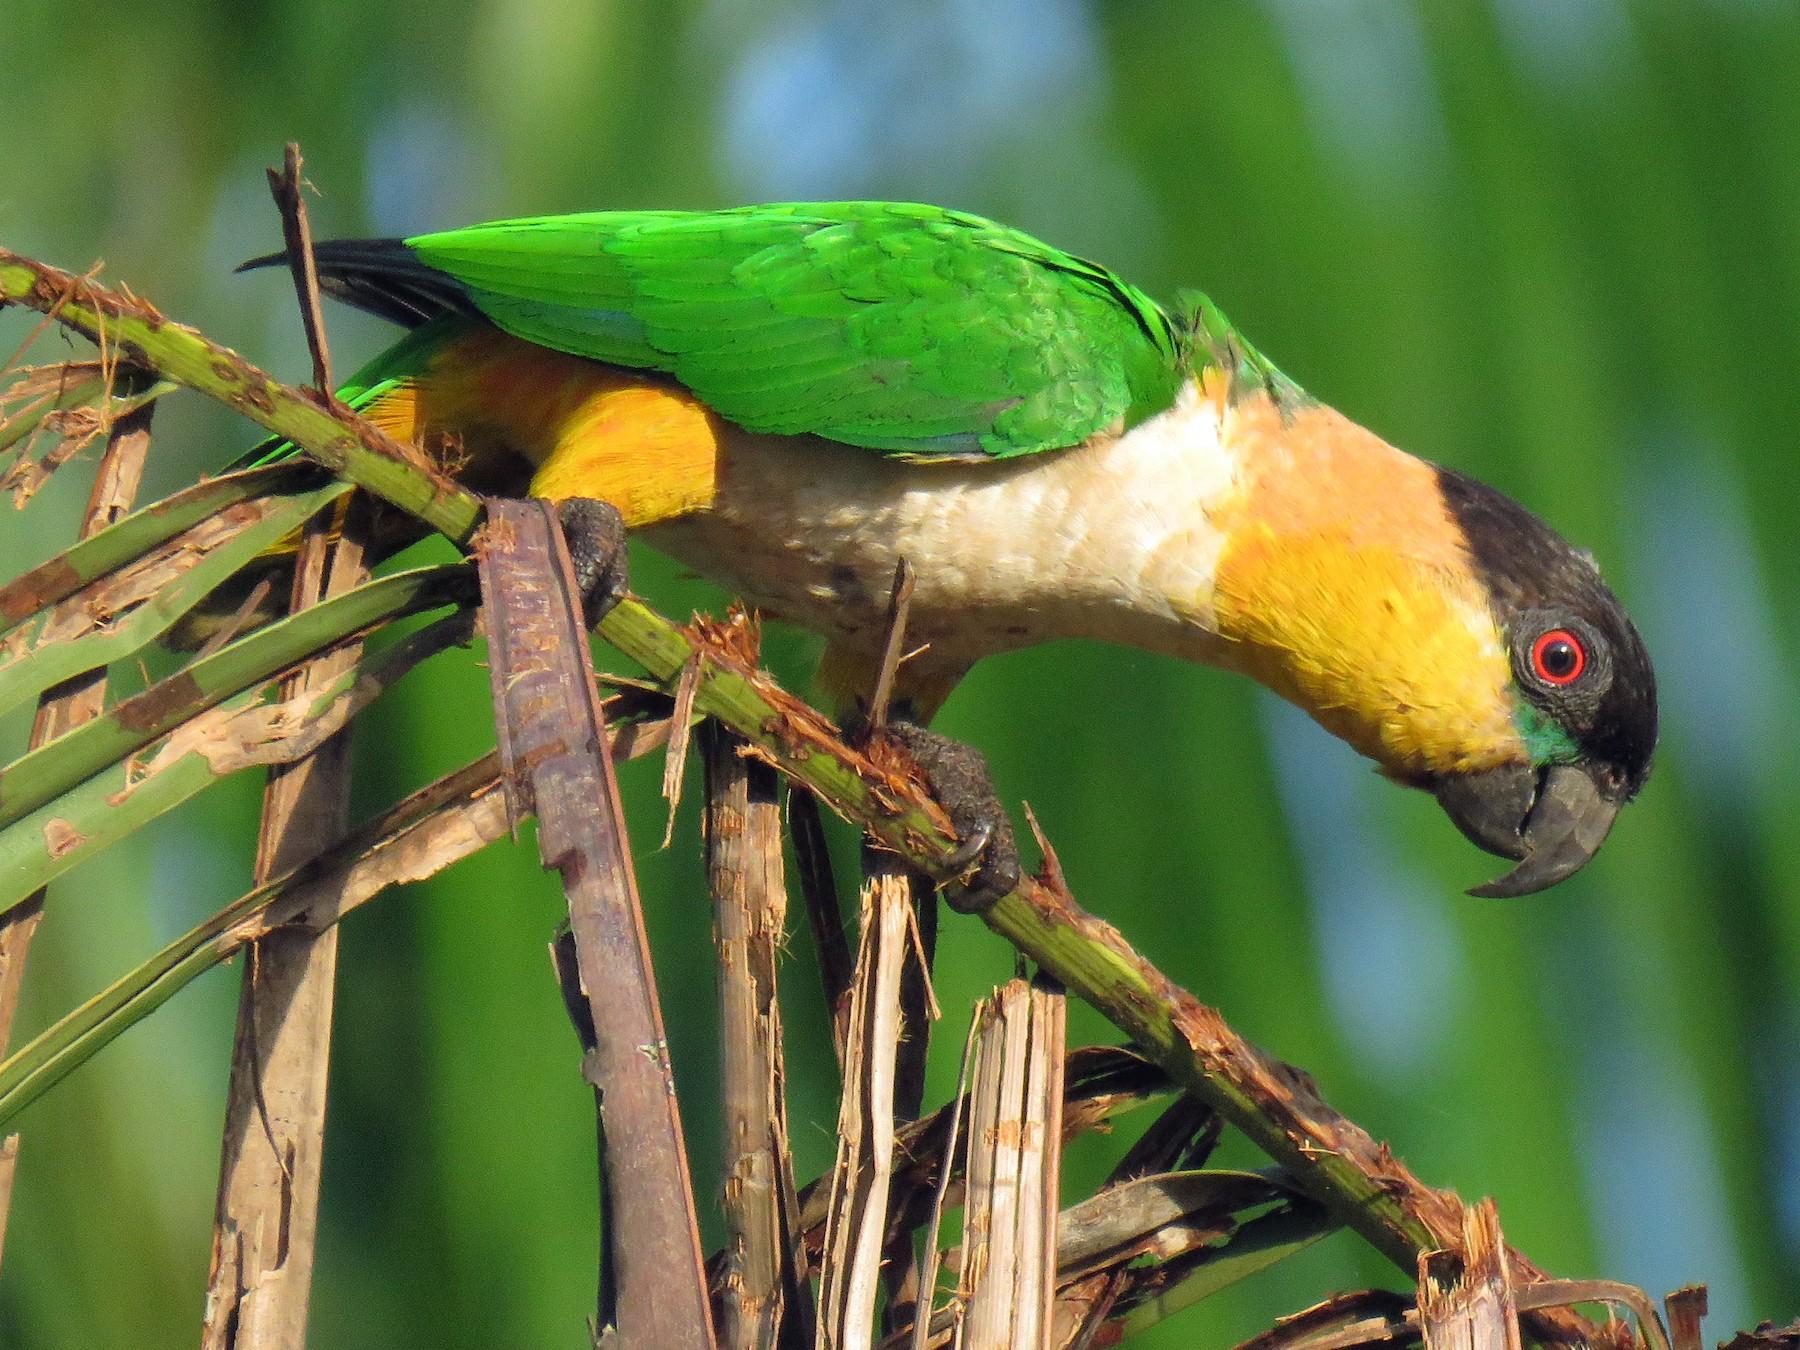 Black-headed Parrot - Juan Pablo Arboleda